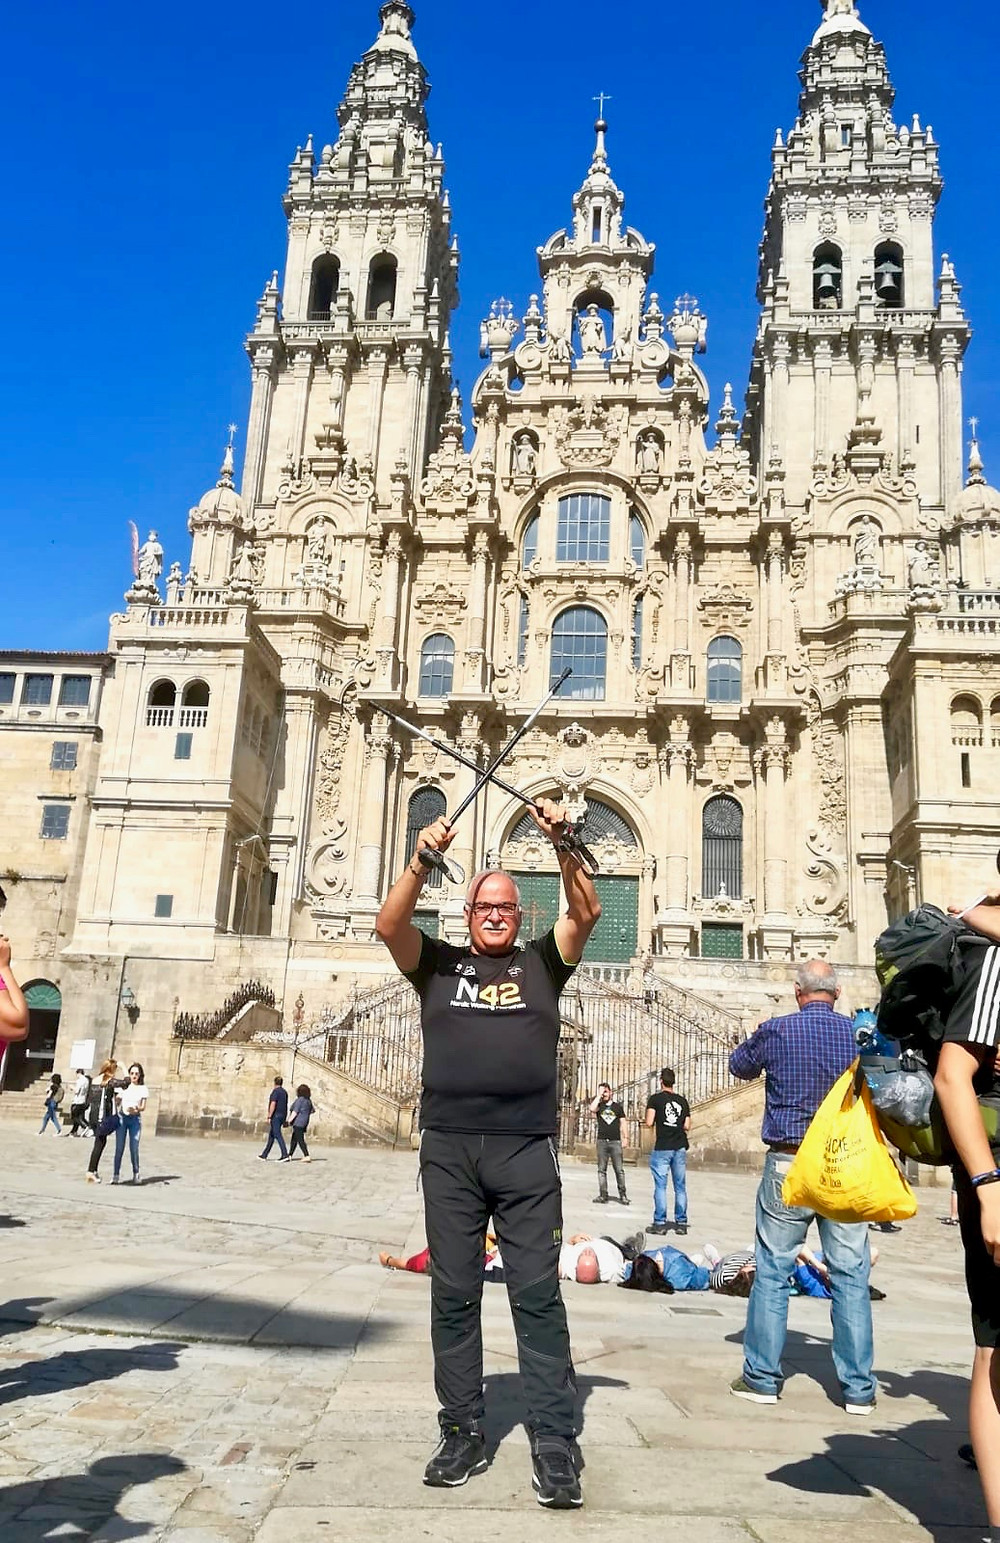 N42 around the world: Italian nordic walking marathon's official t-shirt in Santiago De Compostela